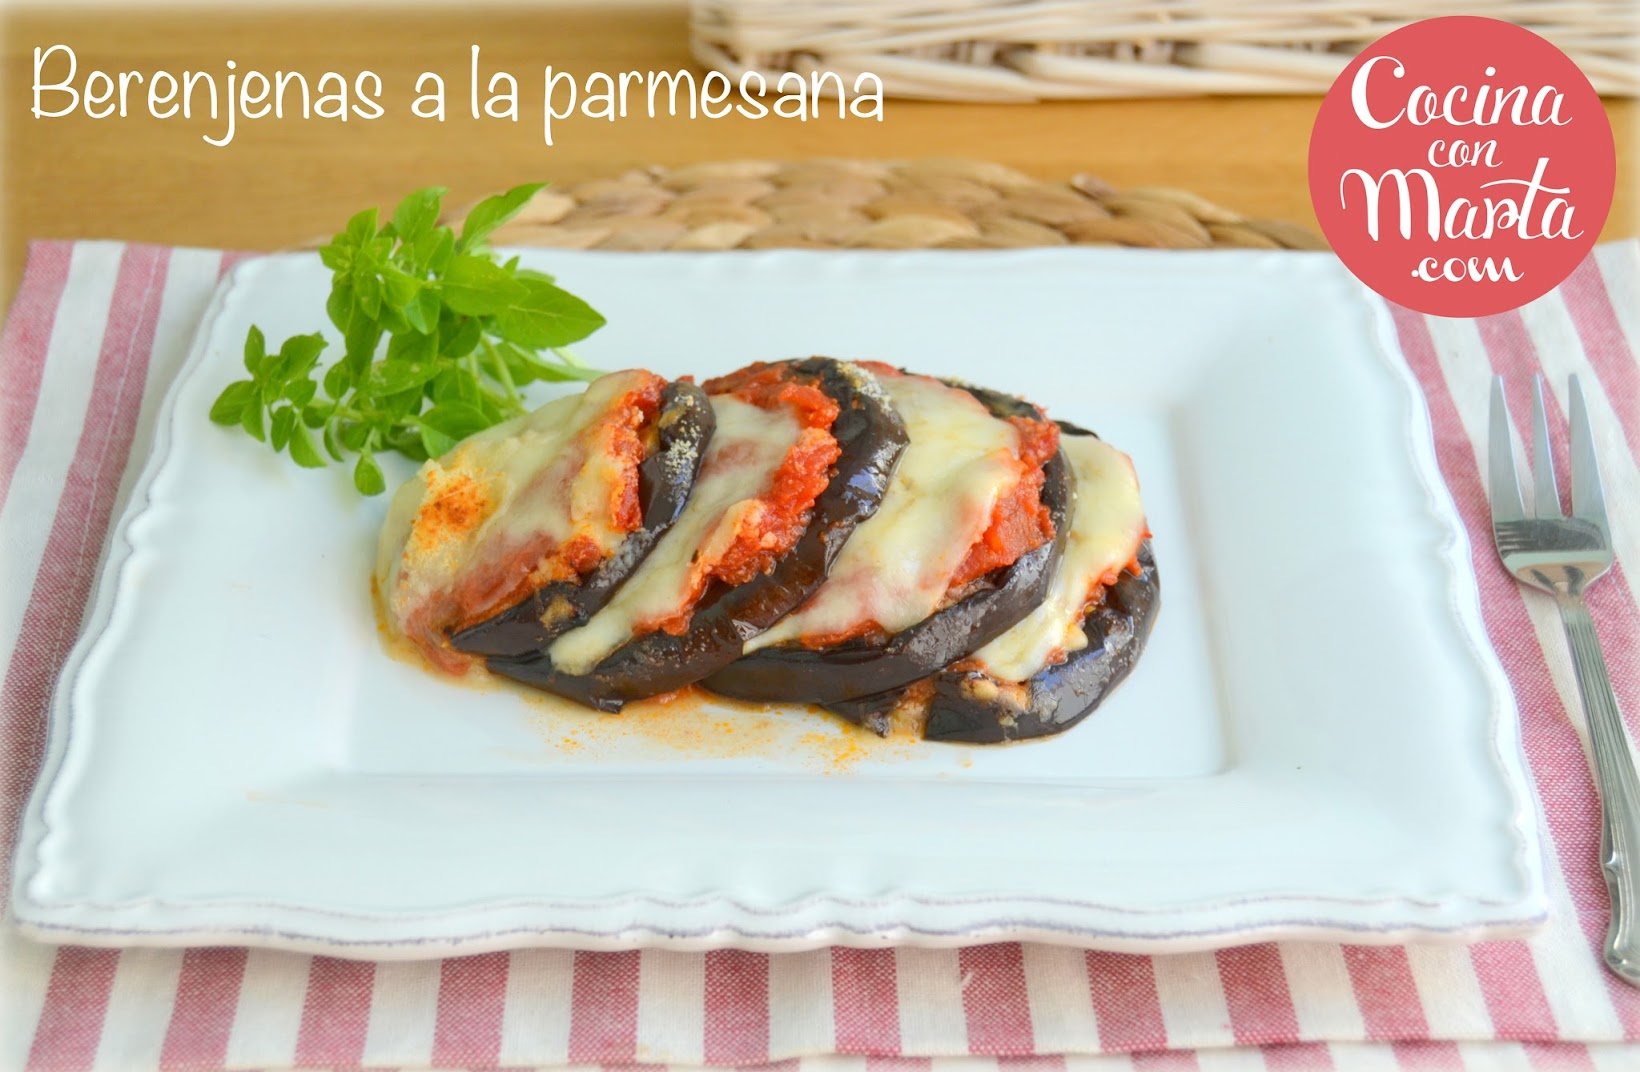 Berenjenas a la parmesana, Parmigiana di melanzane, receta casera tipica italiana, comida italia, mozzarella, albahaca, tomate, Cocina con Marta